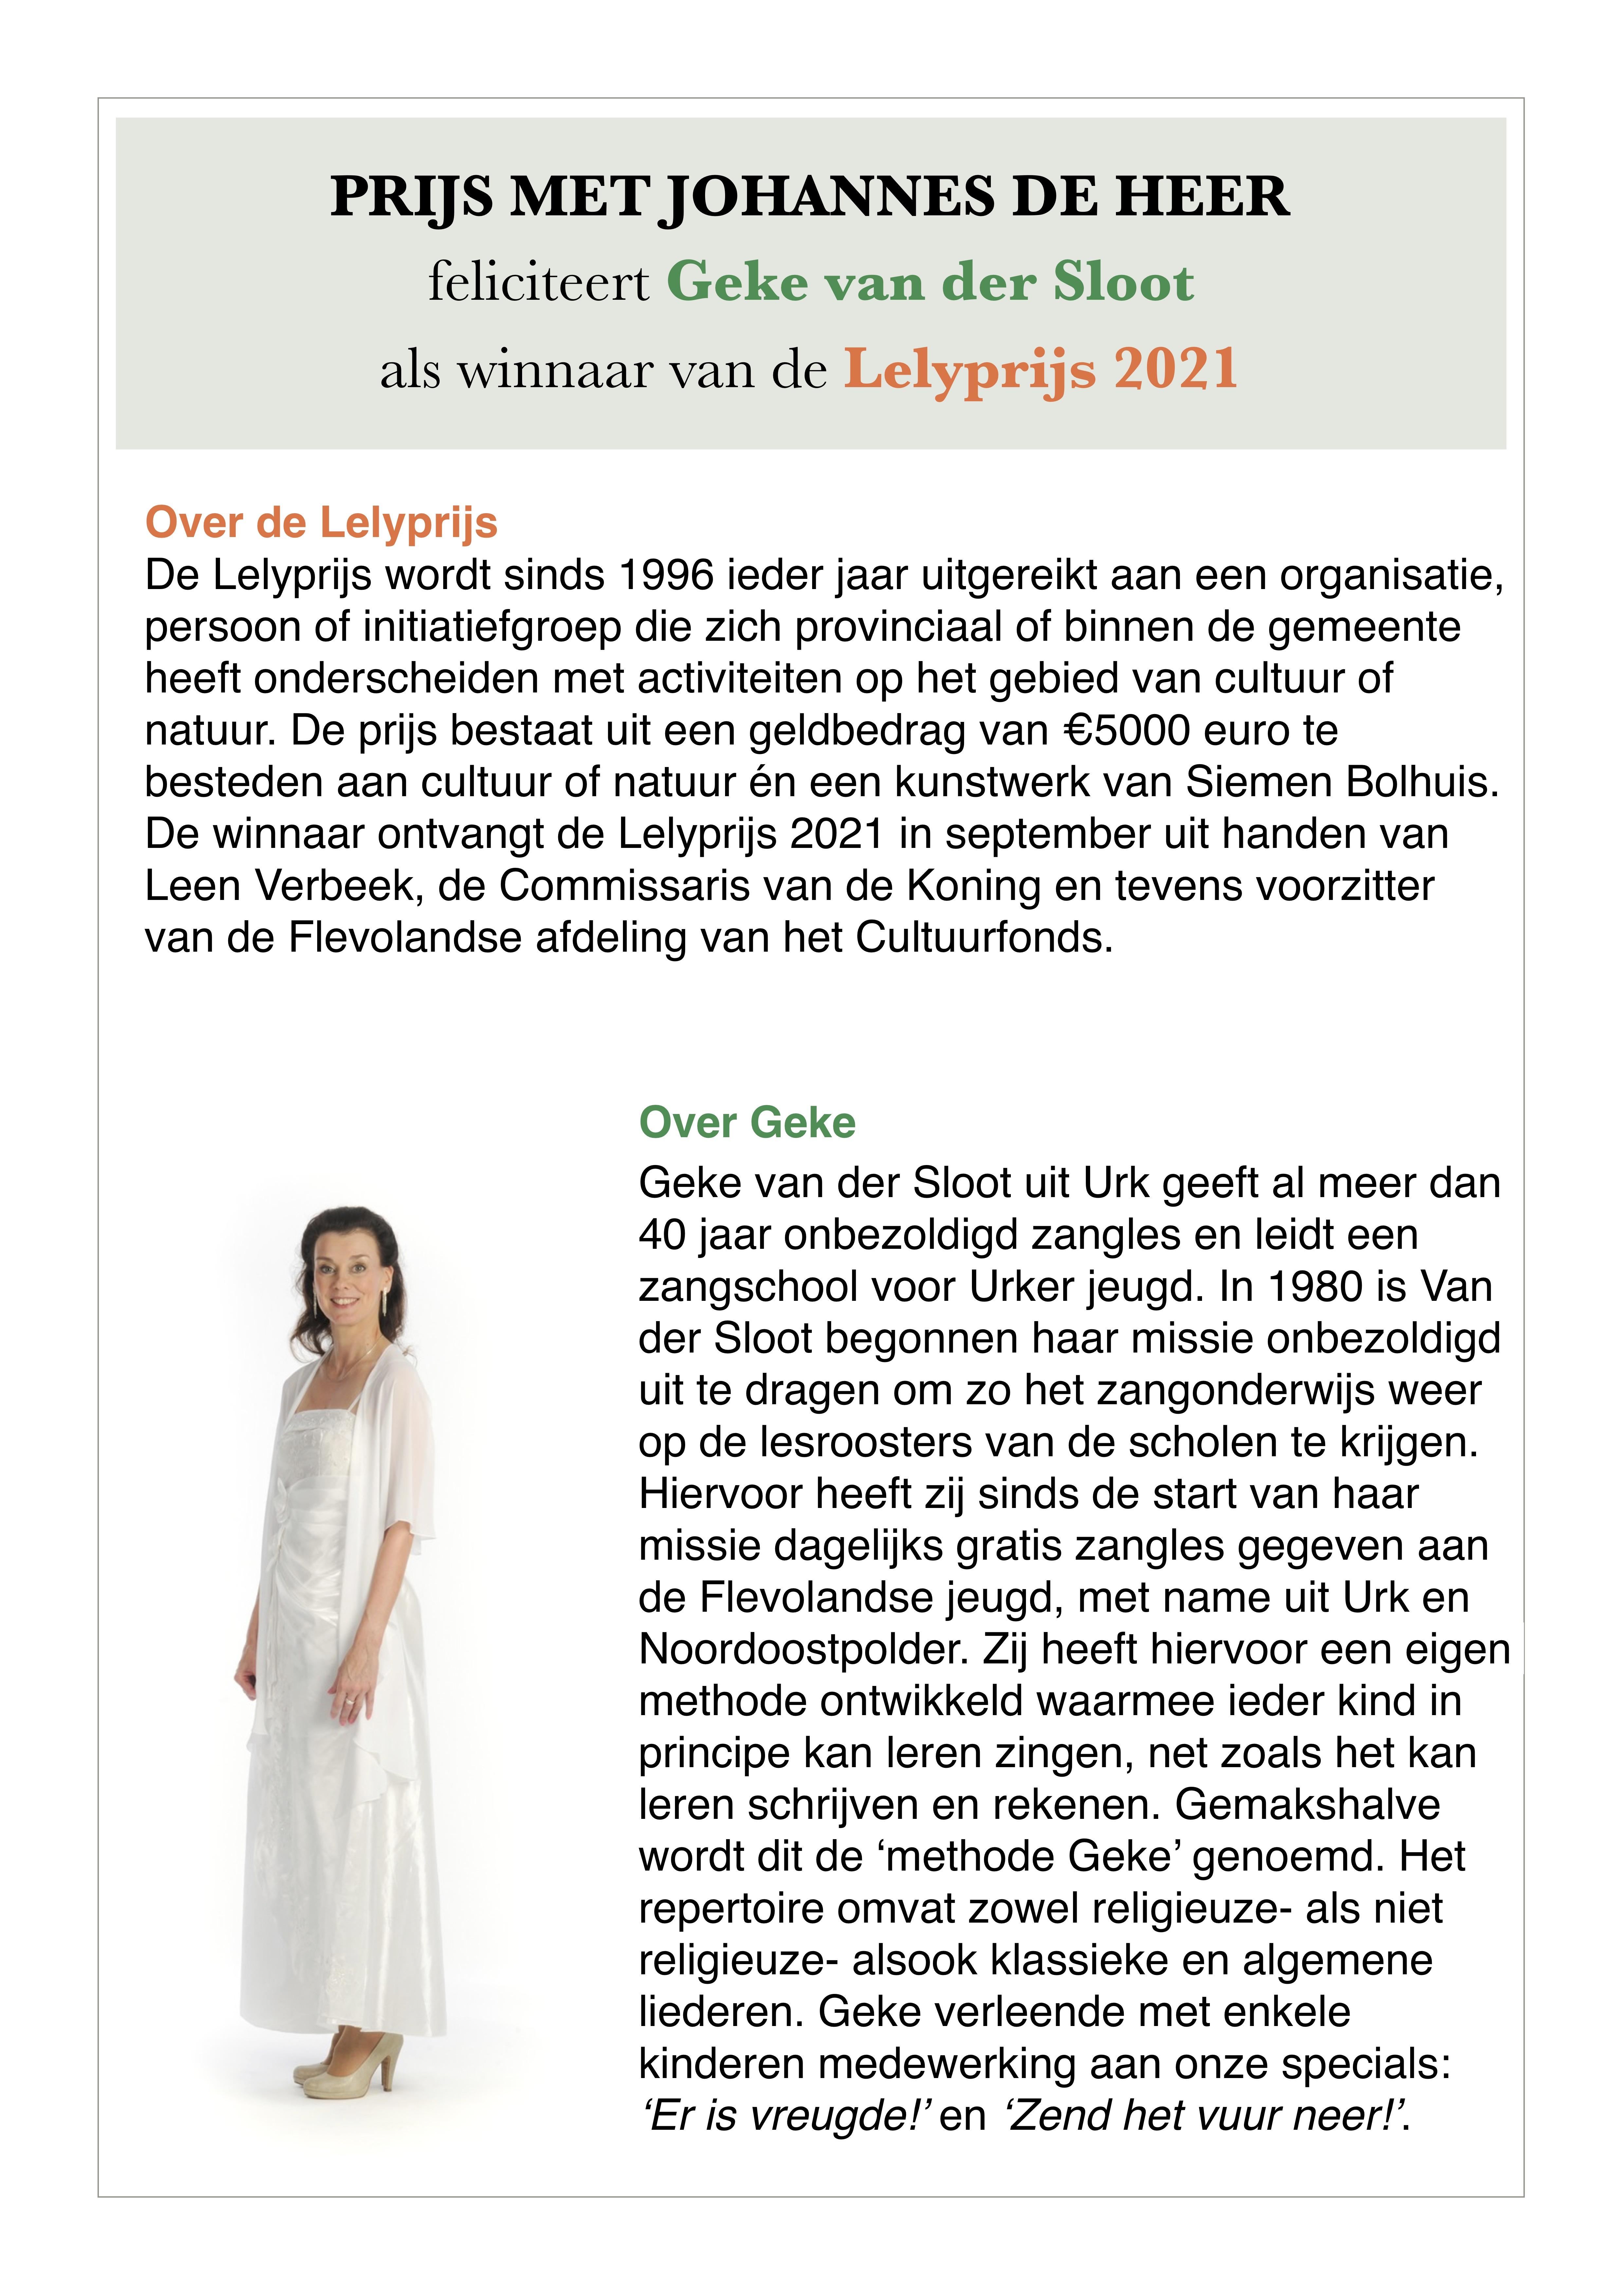 PMJDH feliciteert Geke van der Sloot (Lelyprijs 2021)